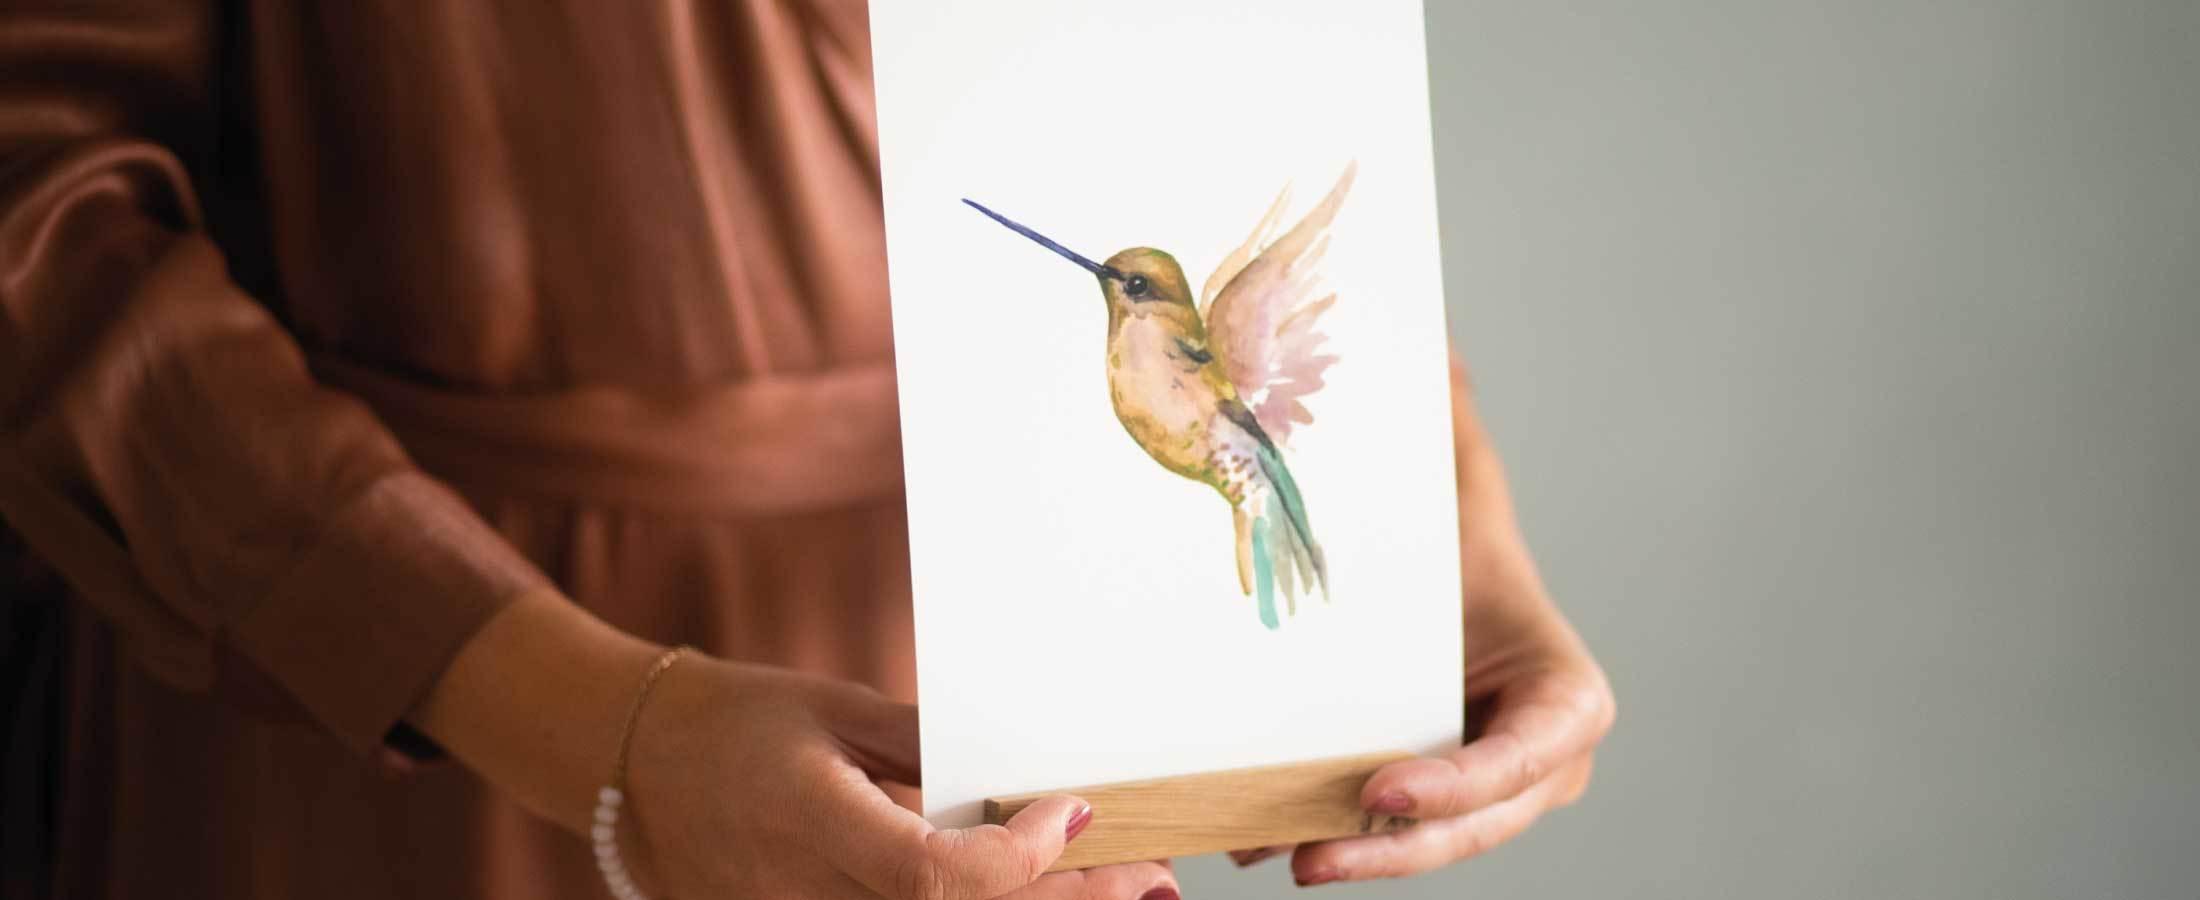 Illustratie Kolibrie